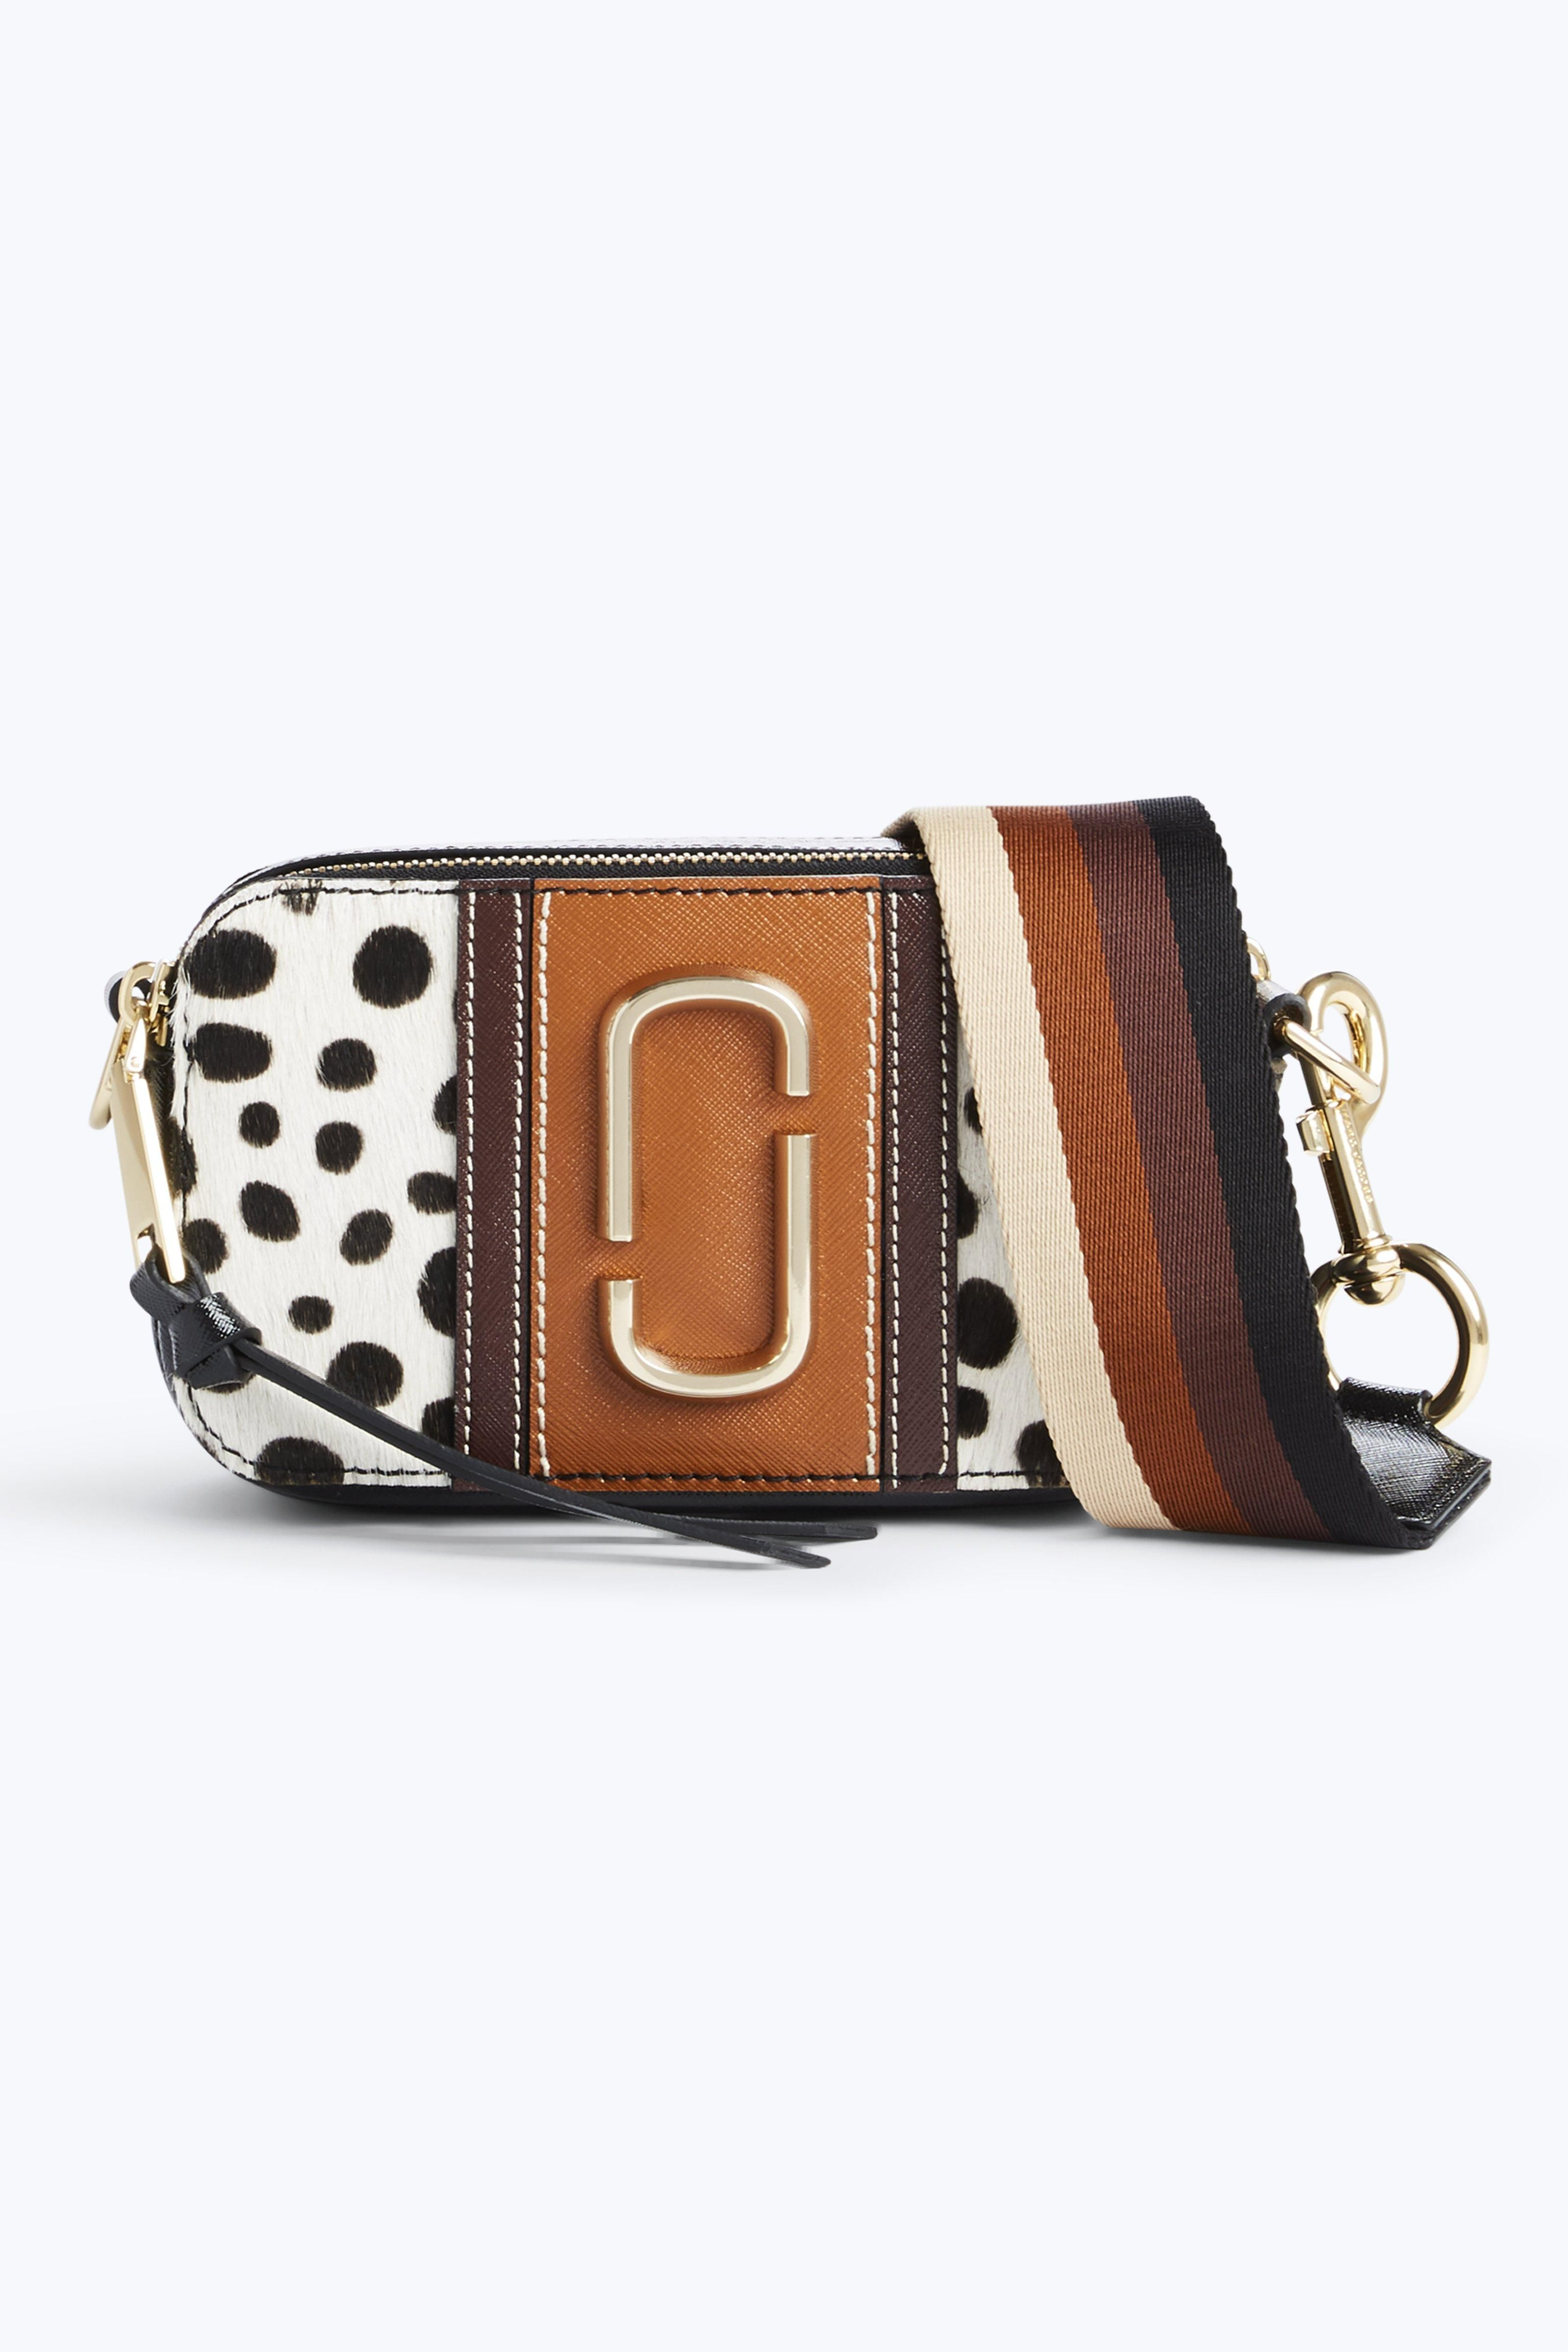 23fc4a4470b4 MARC JACOBS Dalmatian Snapshot Small Camera Bag.  marcjacobs  bags ...